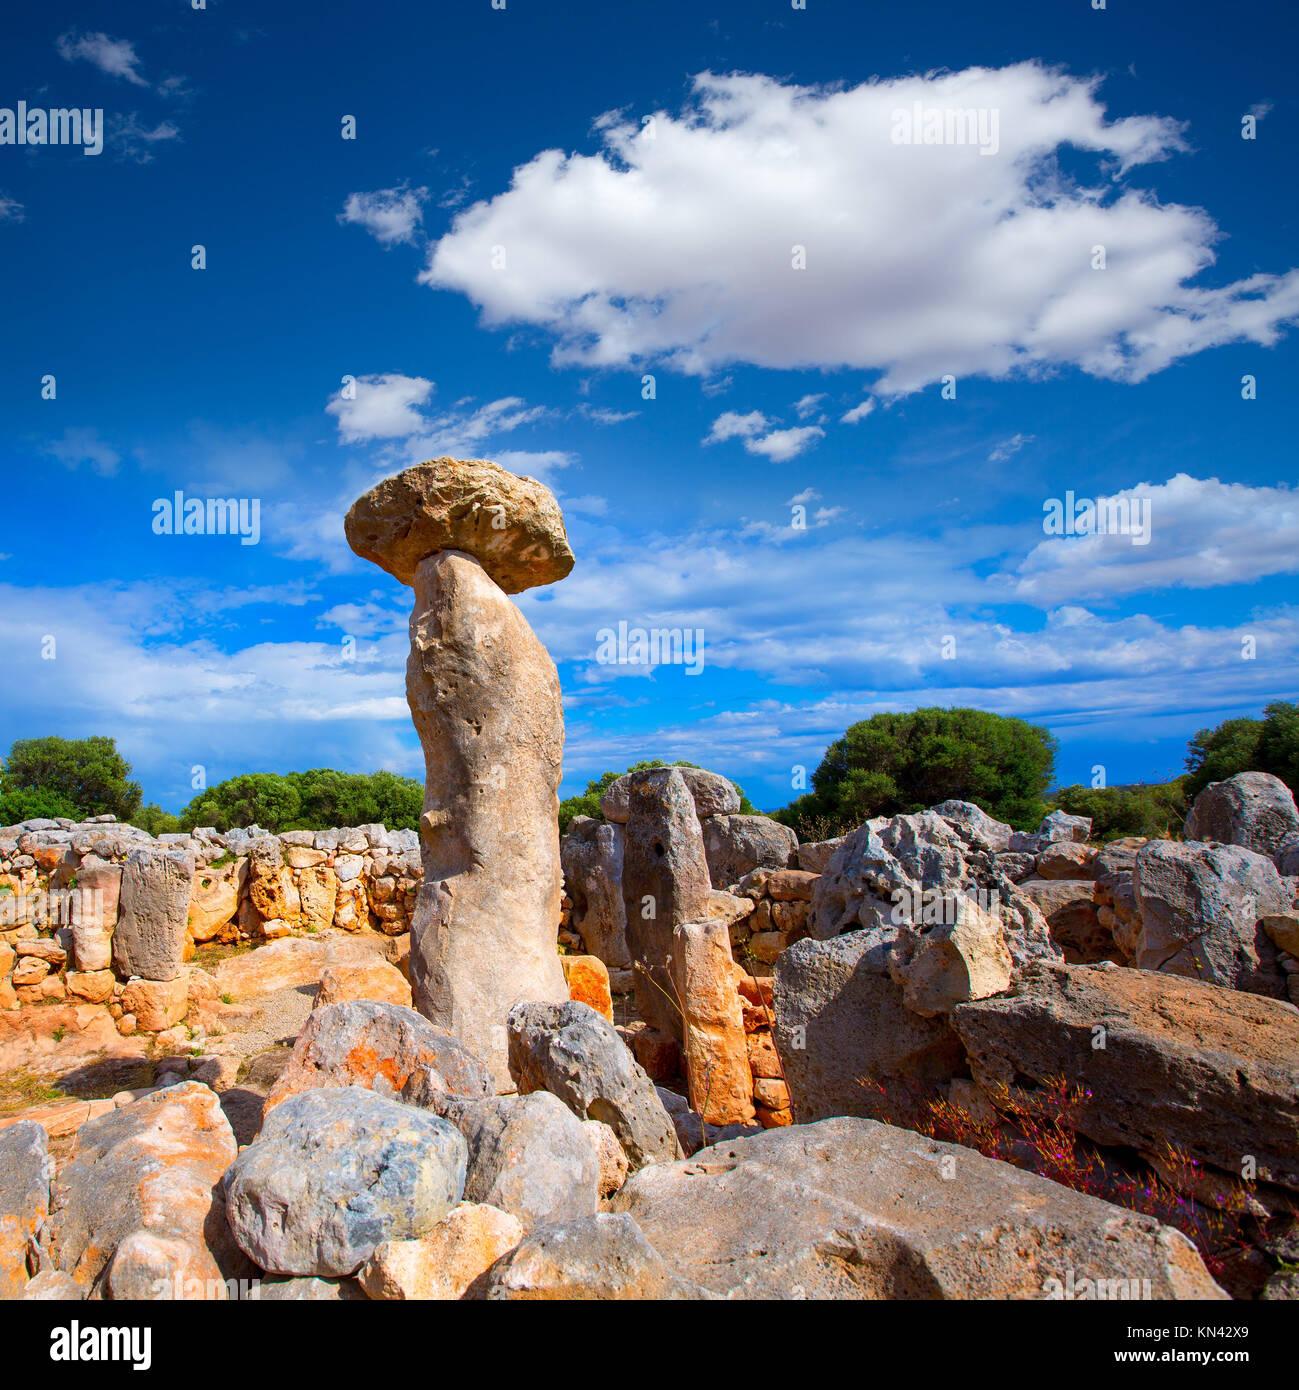 Taules of Menorca Torre de en Gaumes Galmes at Balearic islands of Spain. - Stock Image